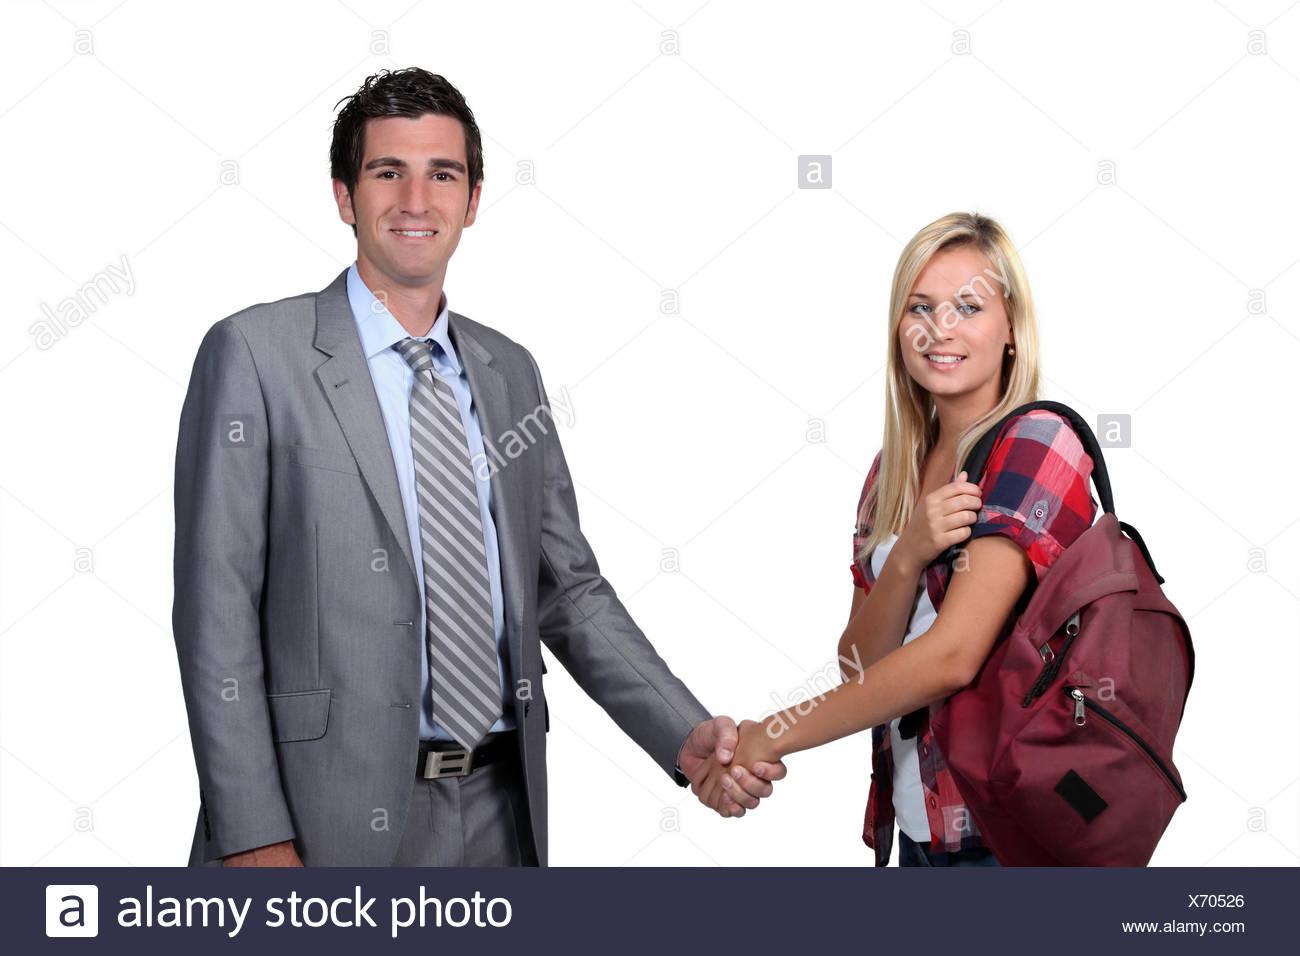 Danke Lehrer Stockfotos & Danke Lehrer Bilder - Alamy